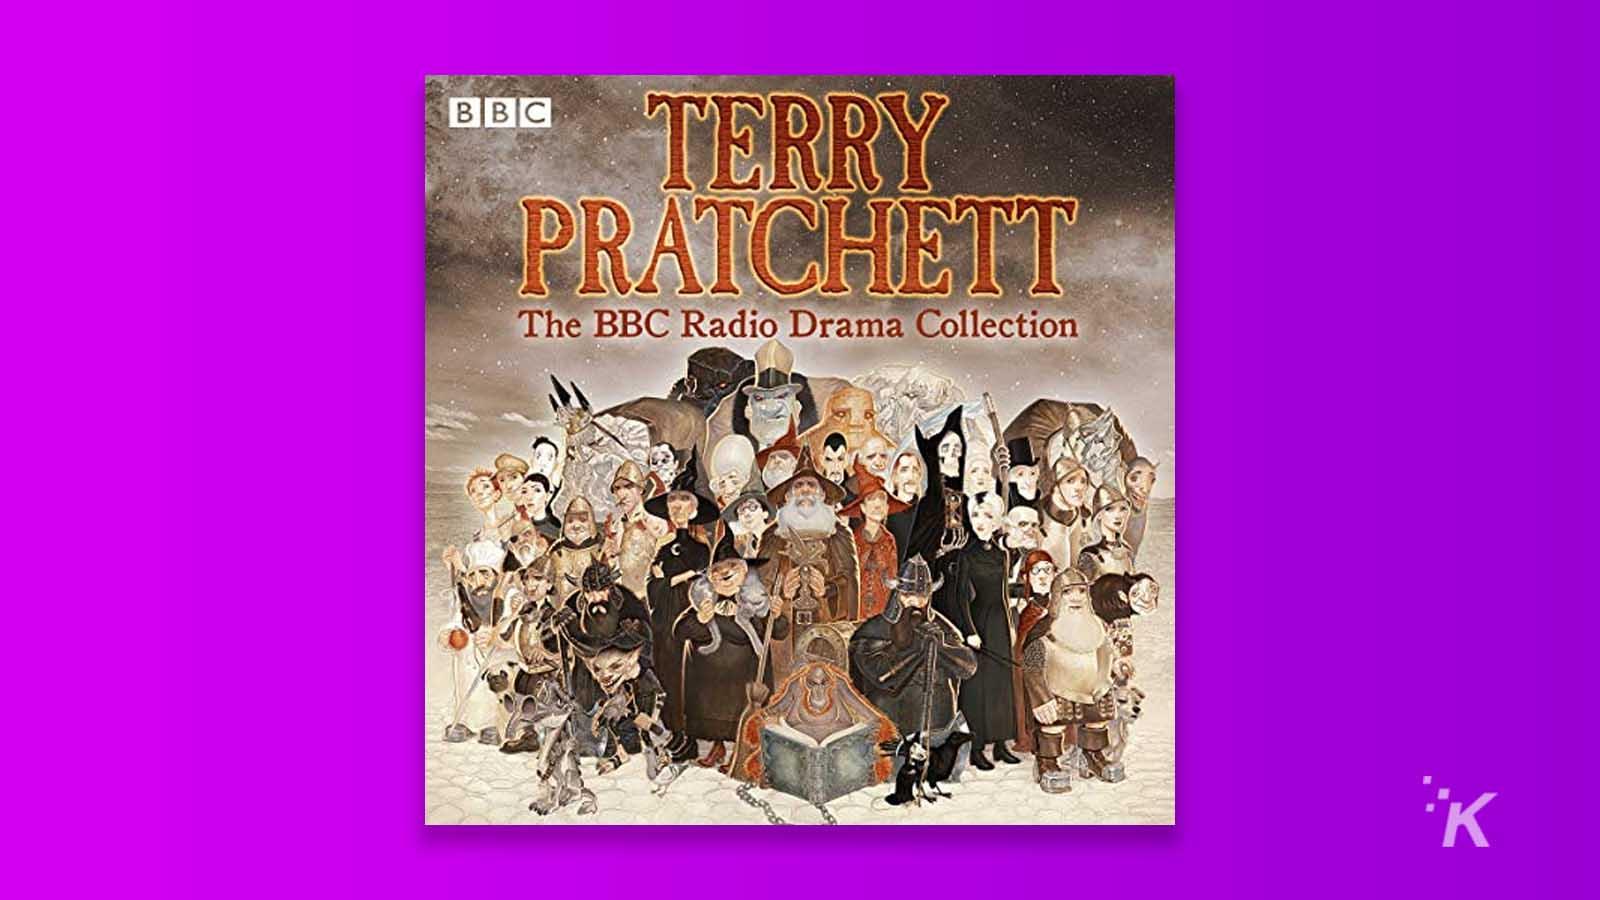 terry pratchett bbc radio drama collection audiobook